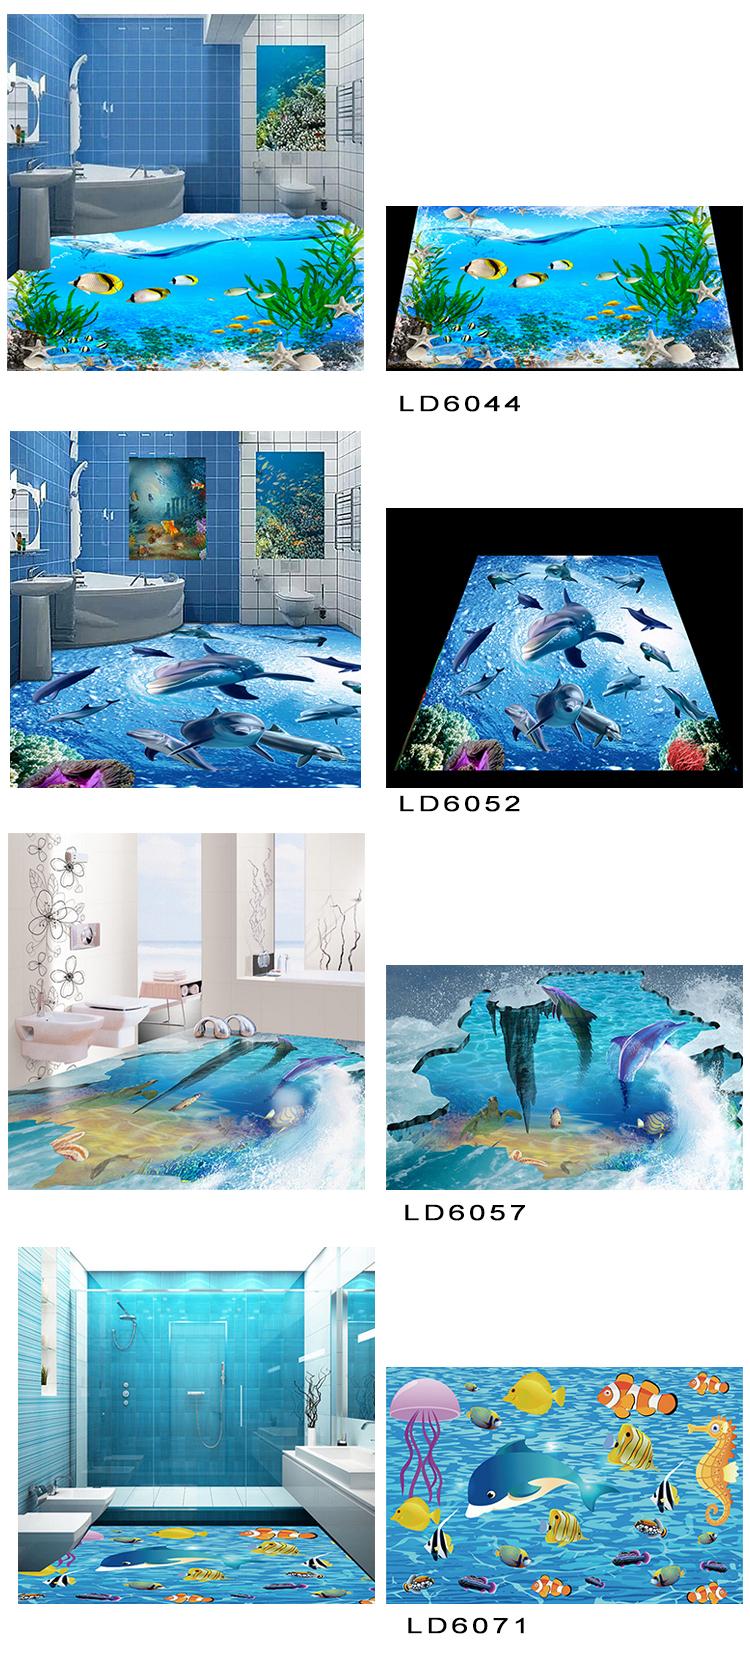 3d Bathroom Tiles 2015 New Products Bathroom Tile 3d Ceramic Floor Tile 3d Wall And